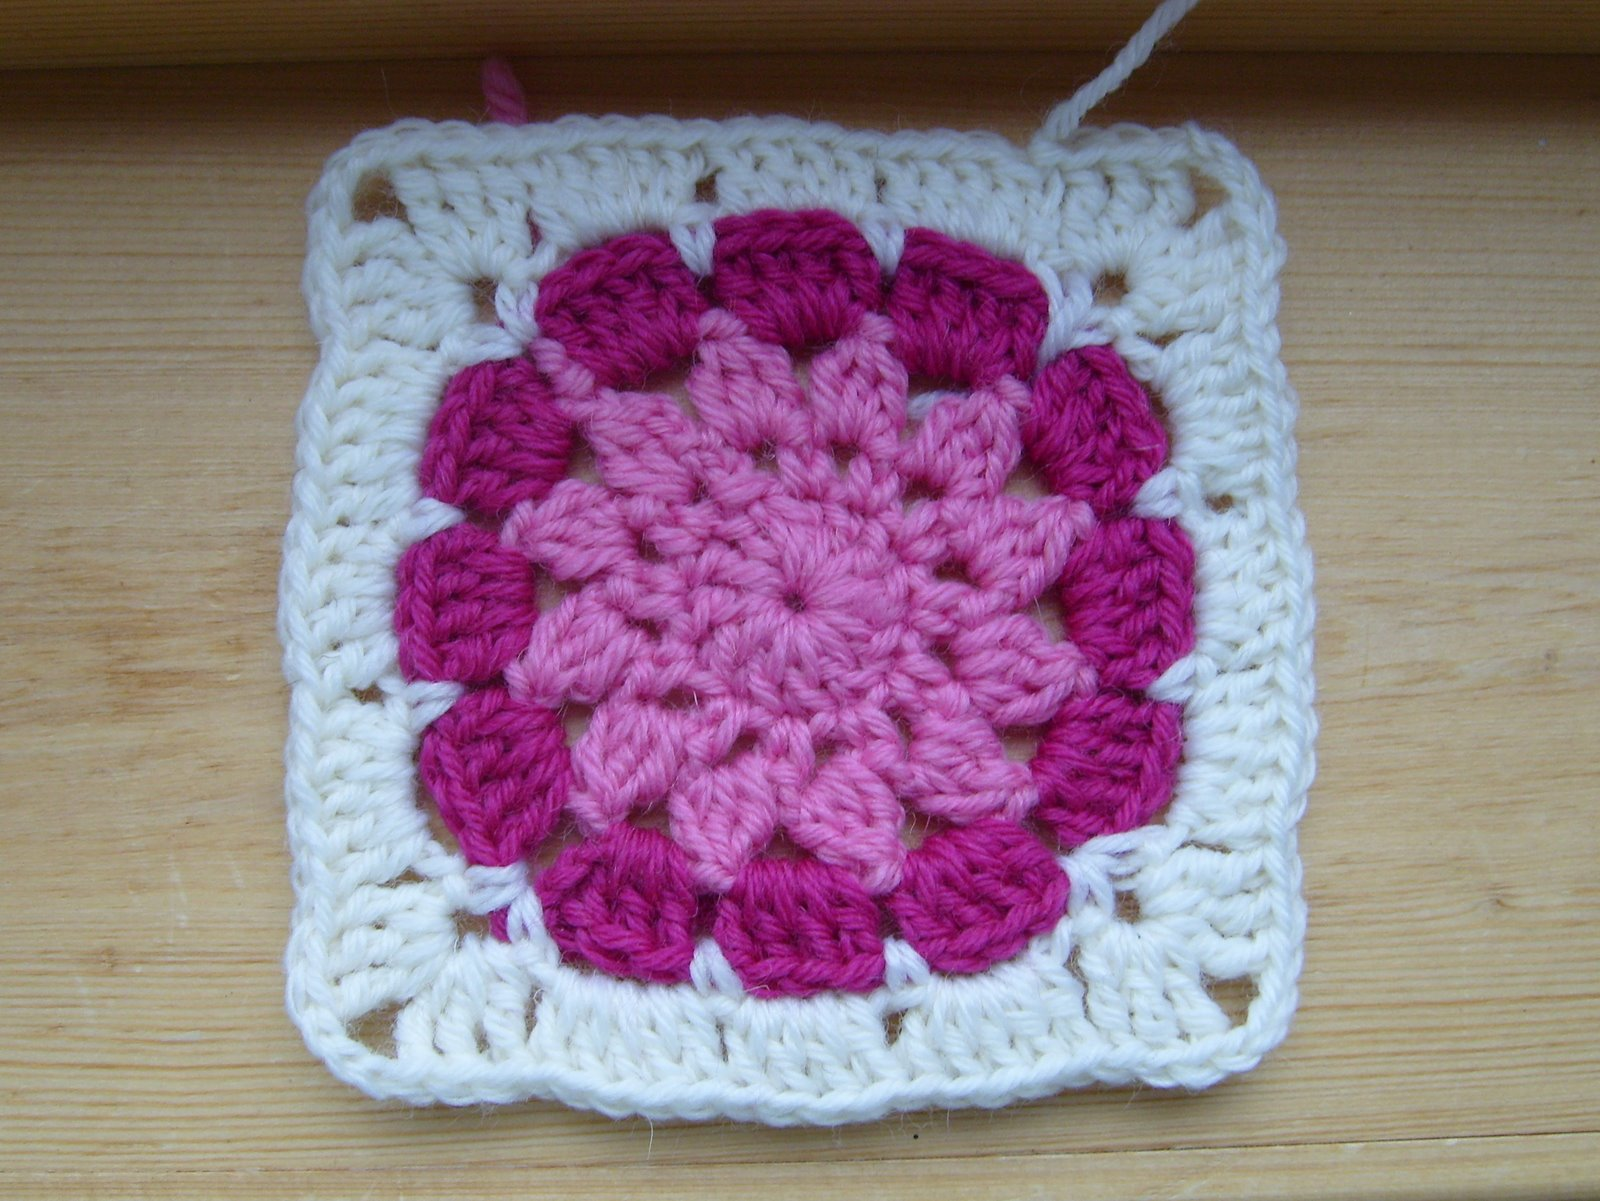 Renees Crochet: Crochet Squares...